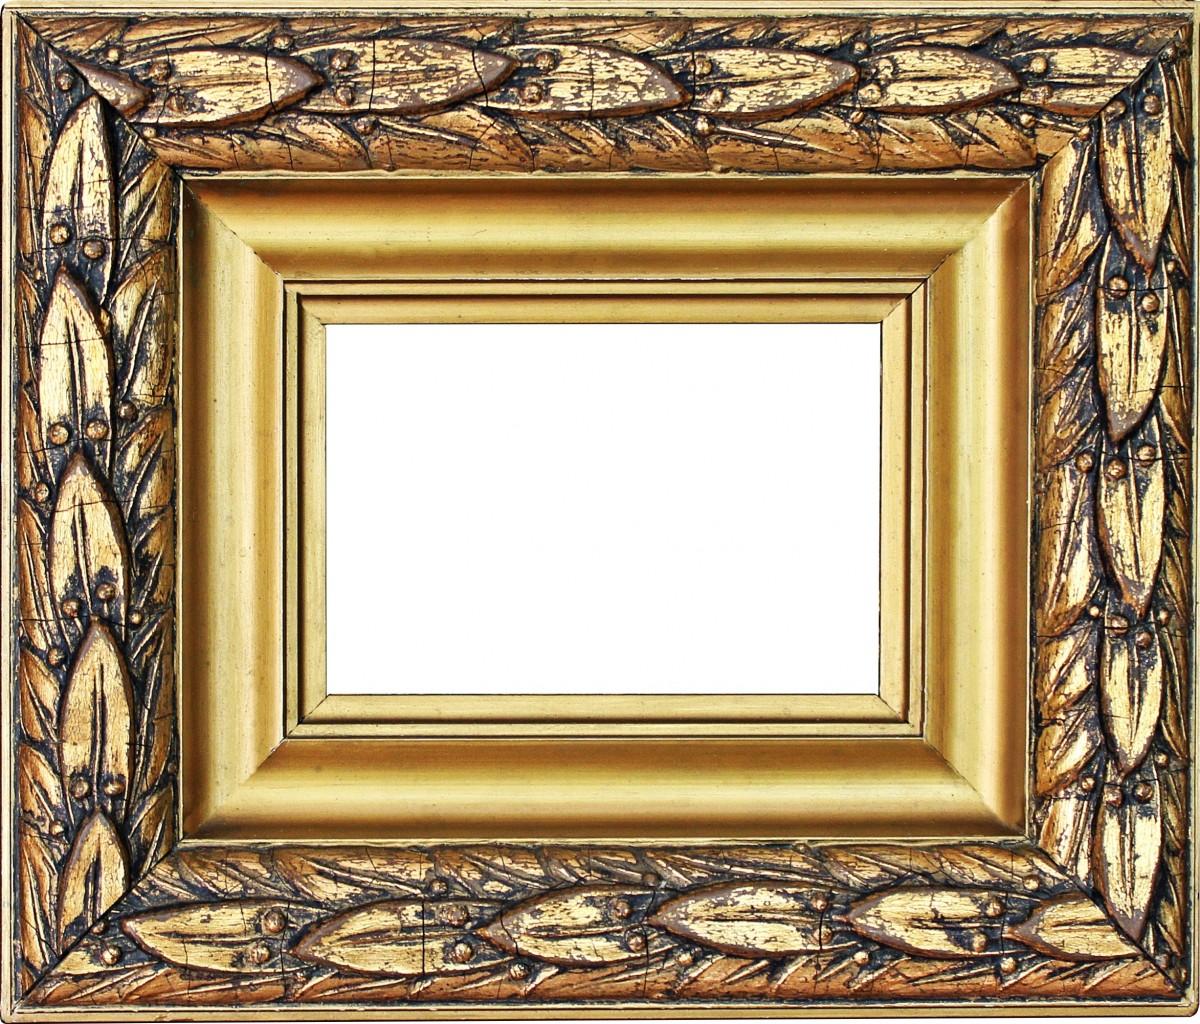 Free Images Wood Antique Empty Decor Gold Rectangle